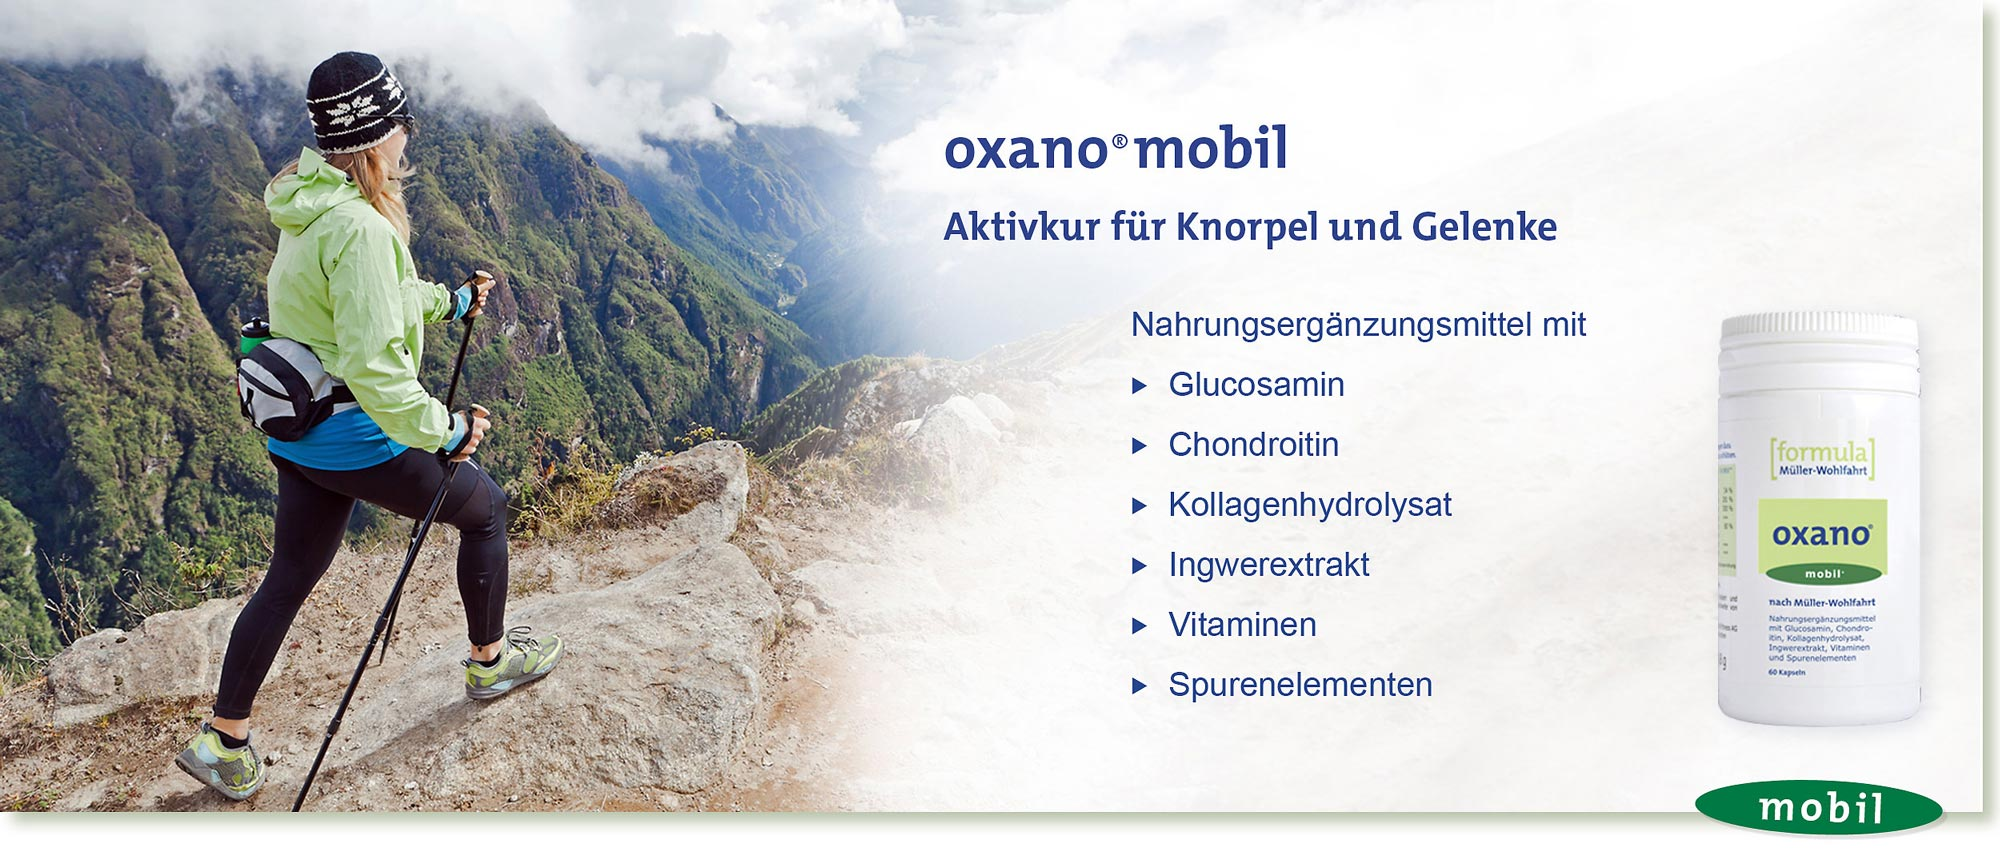 HeadImage | OXANO-Mobil Gelenk-Kapseln nach Müller-Wohlfahrt mit Glucosamin, Chondroitin, Kollagenhydrolysat, Ingwerextrakt